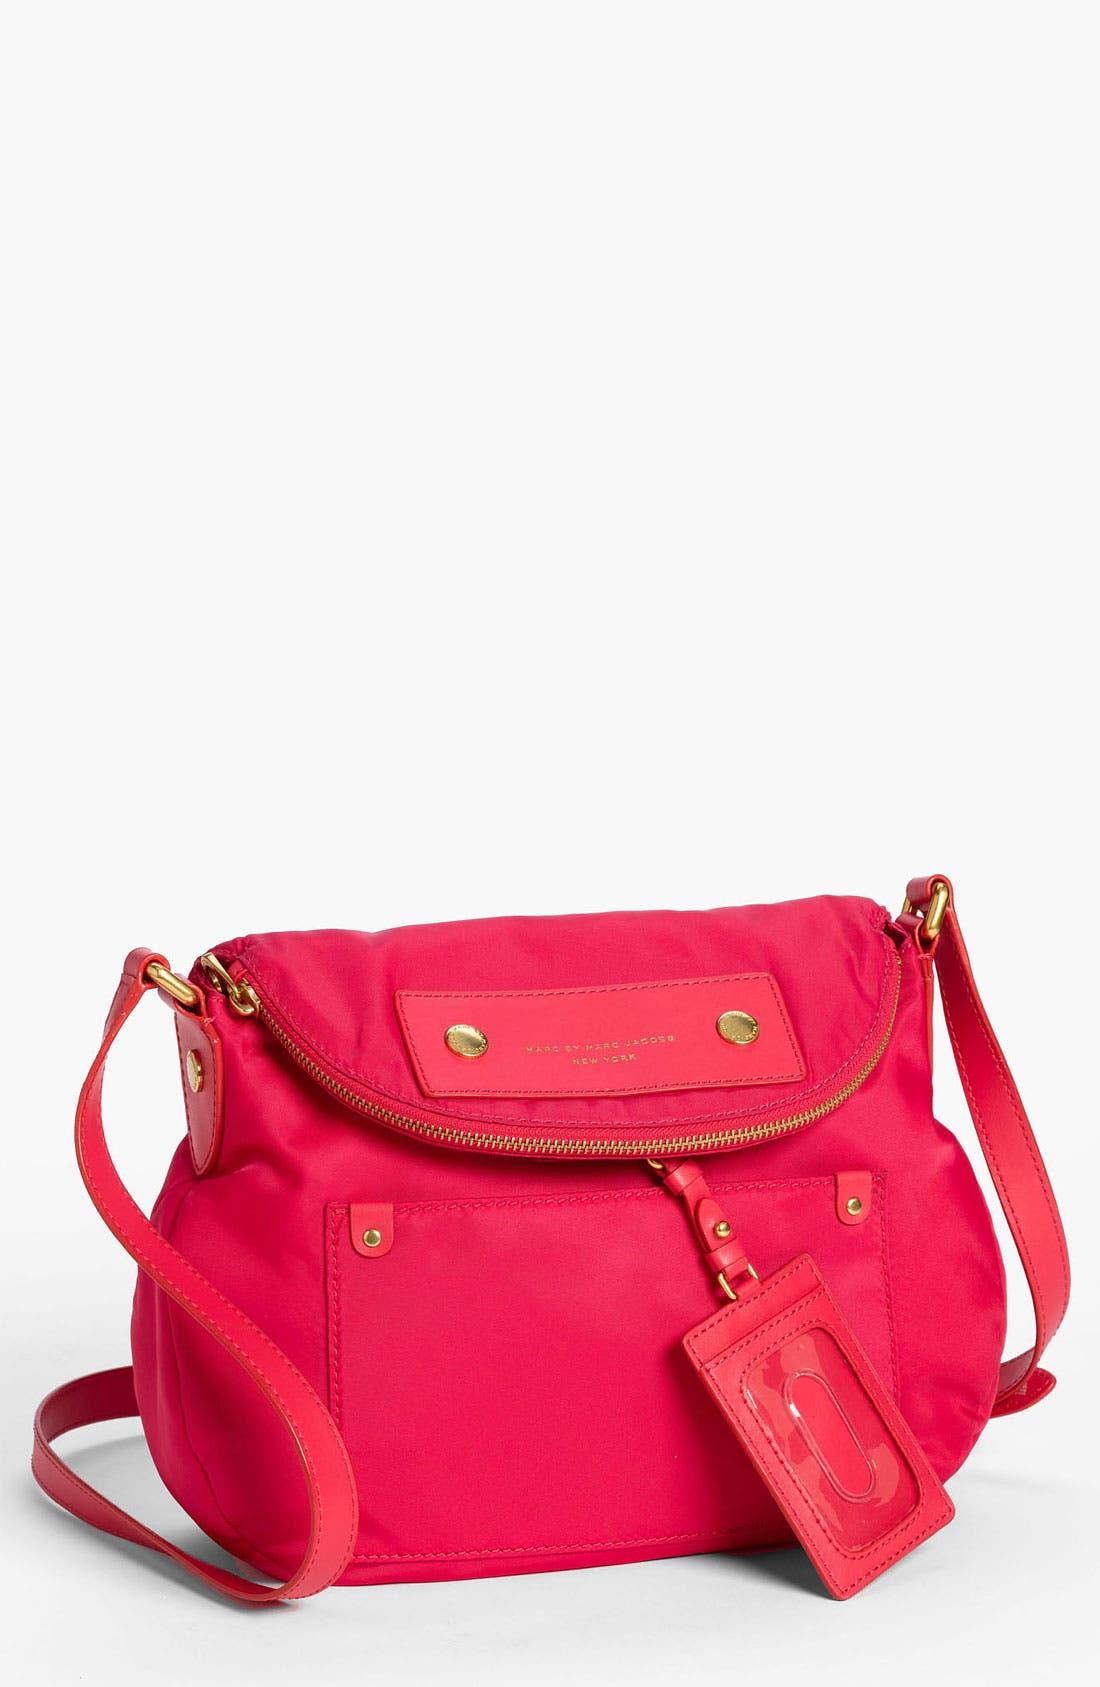 Main Image - MARC BY MARC JACOBS 'Preppy Nylon - Natasha' Crossbody Bag